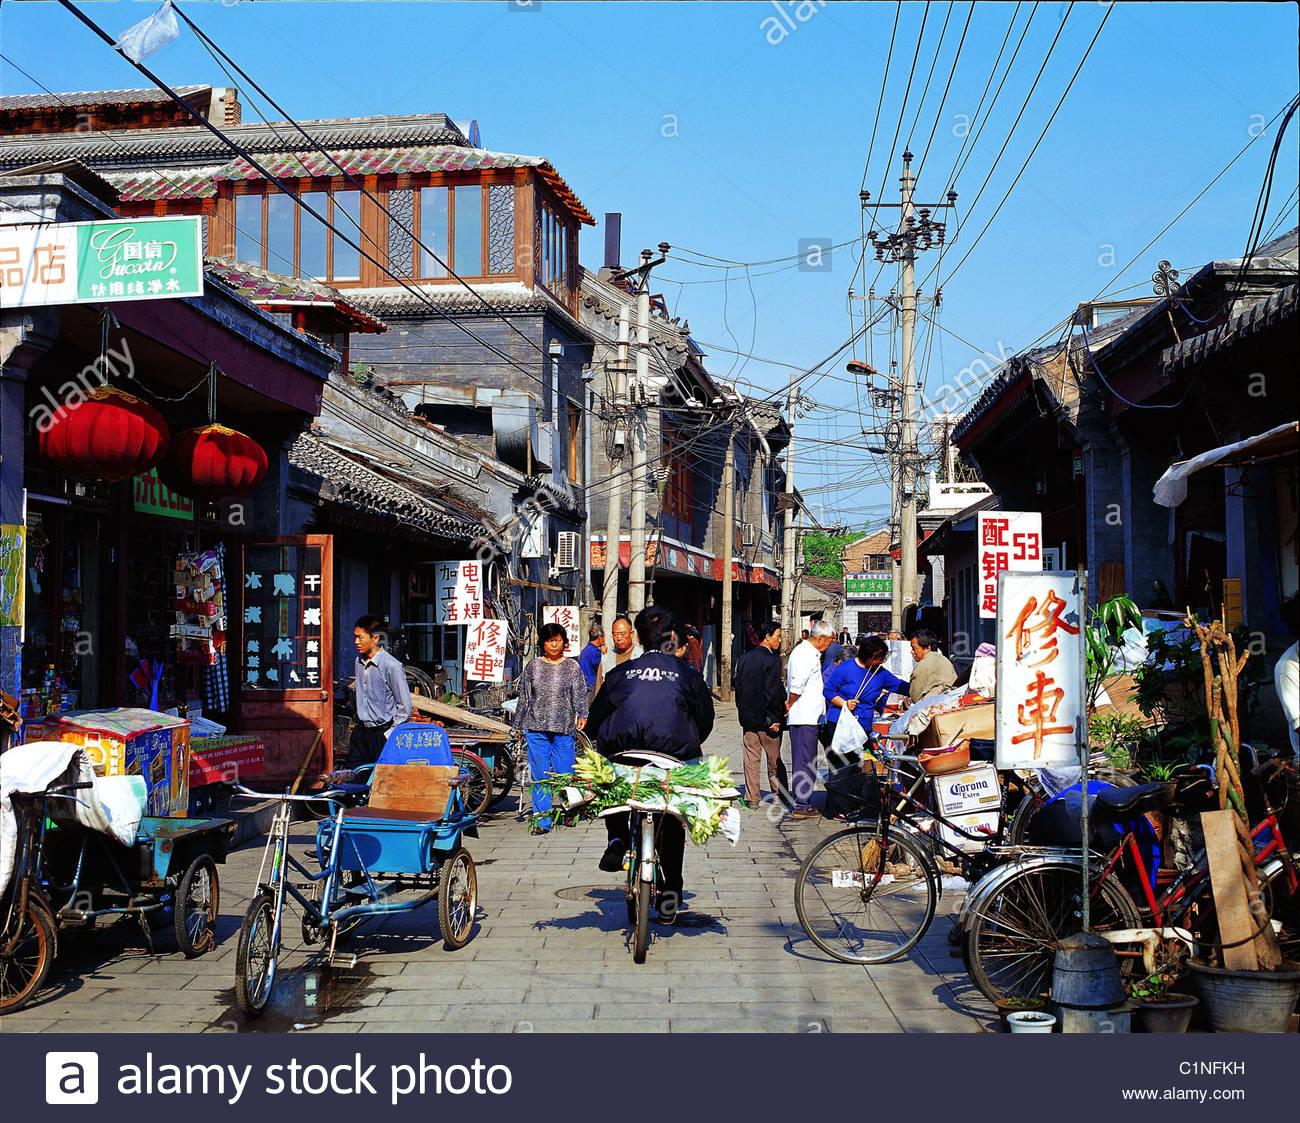 Beijing City, Shichahai, Hutong, Dongcheng District, China - Stock Image